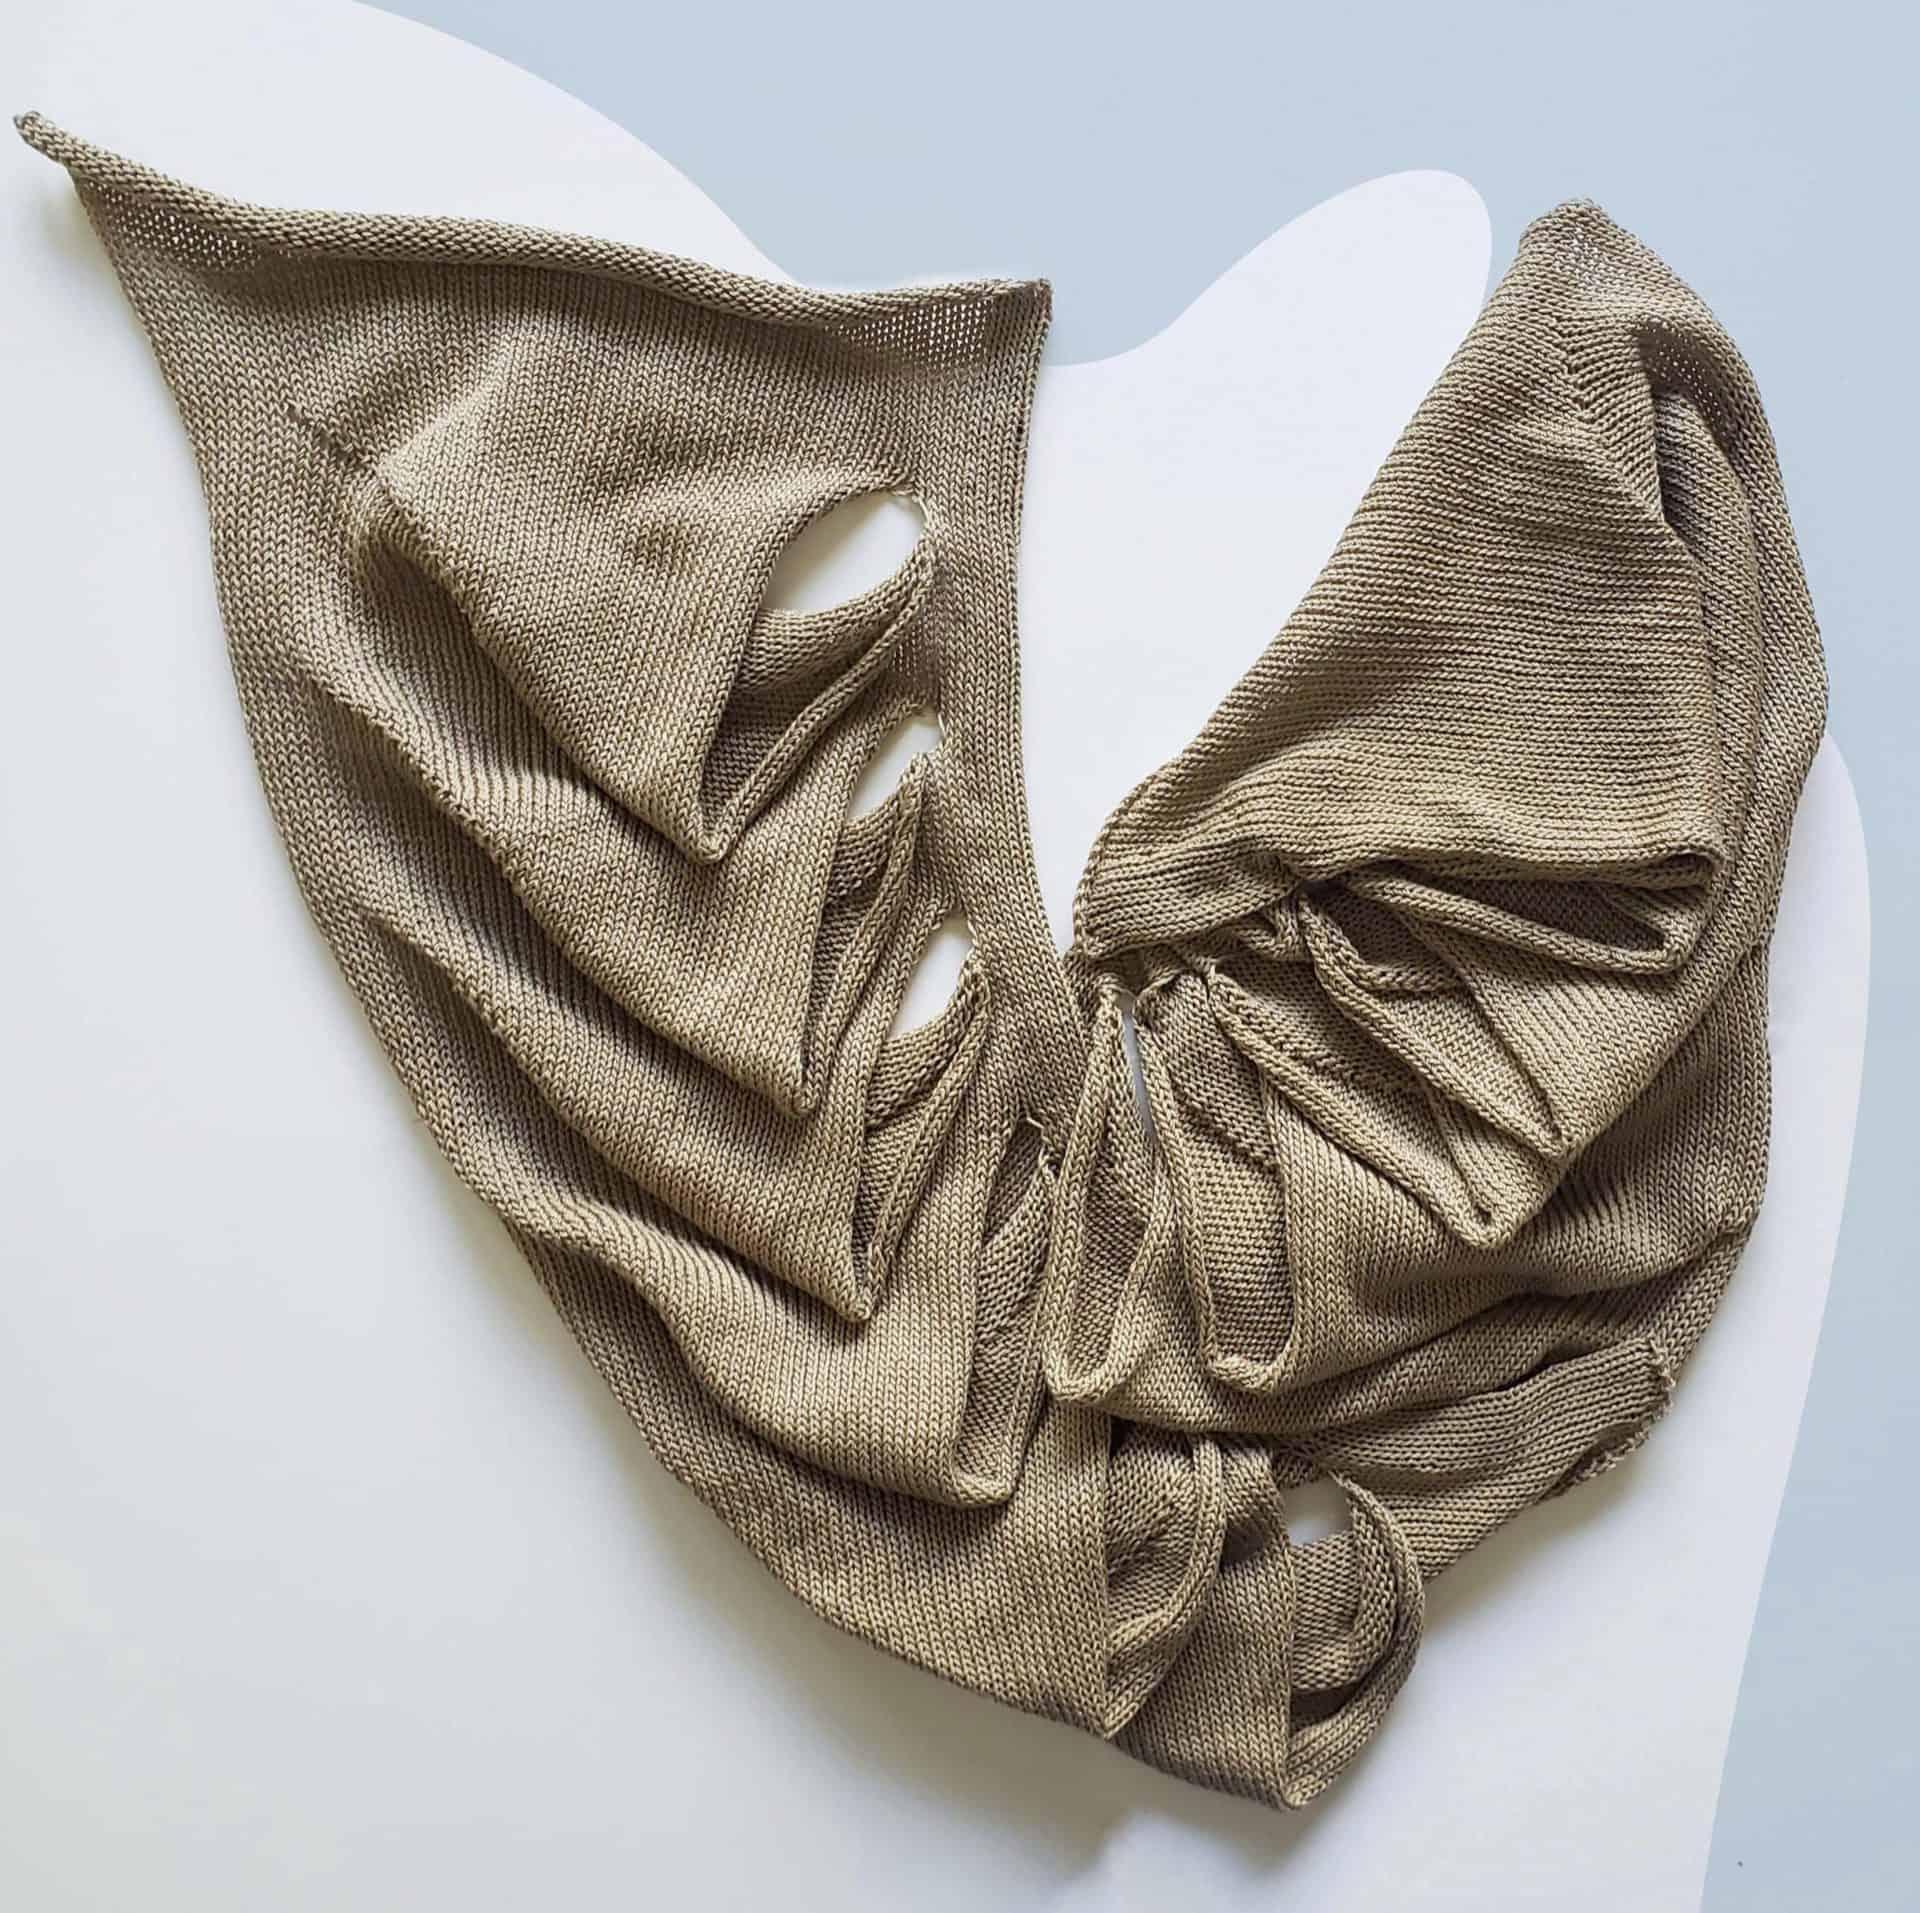 Featured Work, Rashida Birdlong, BFA Knitwear Design